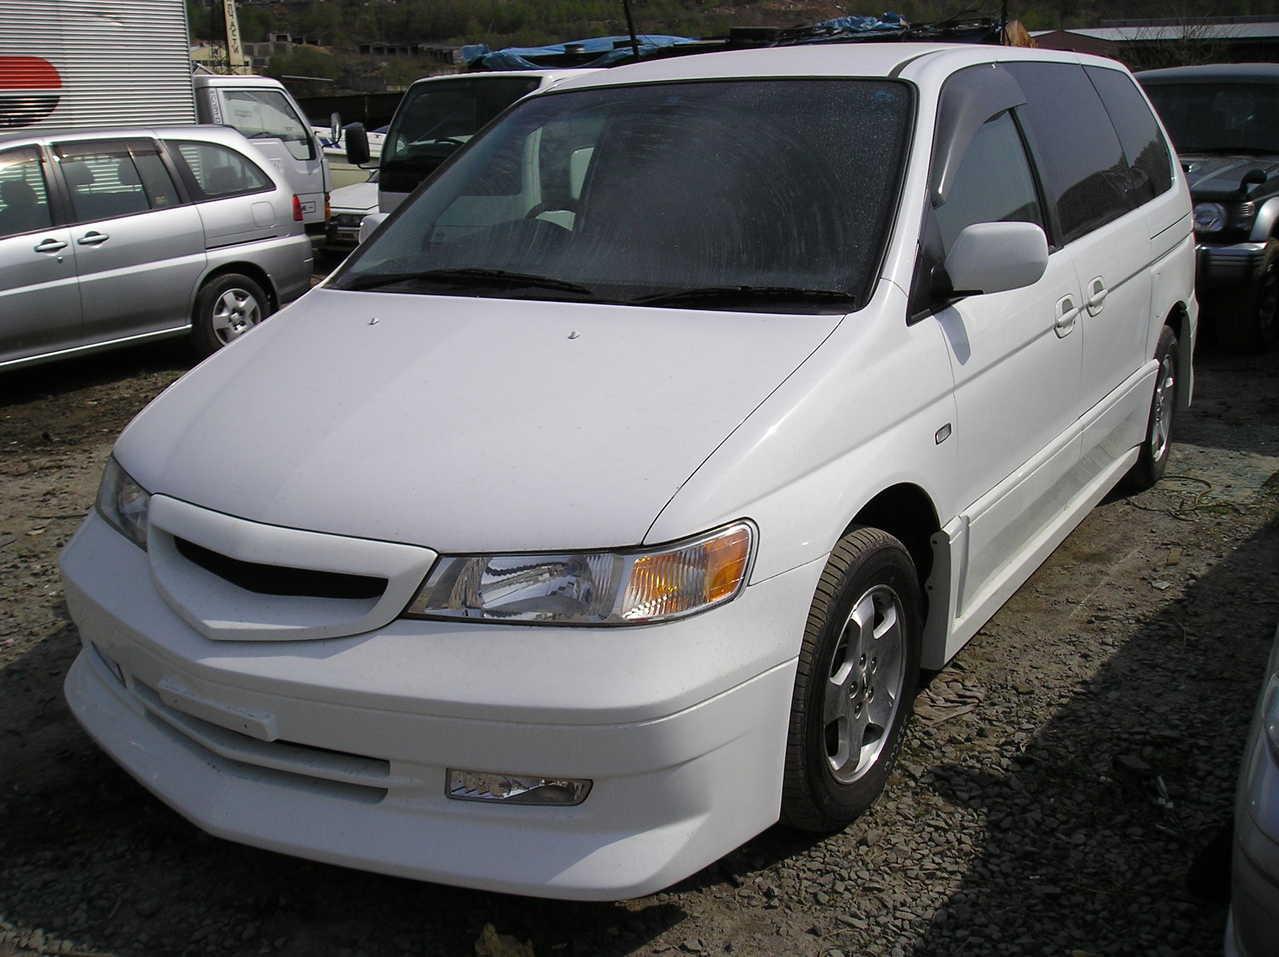 Honda Lagreat